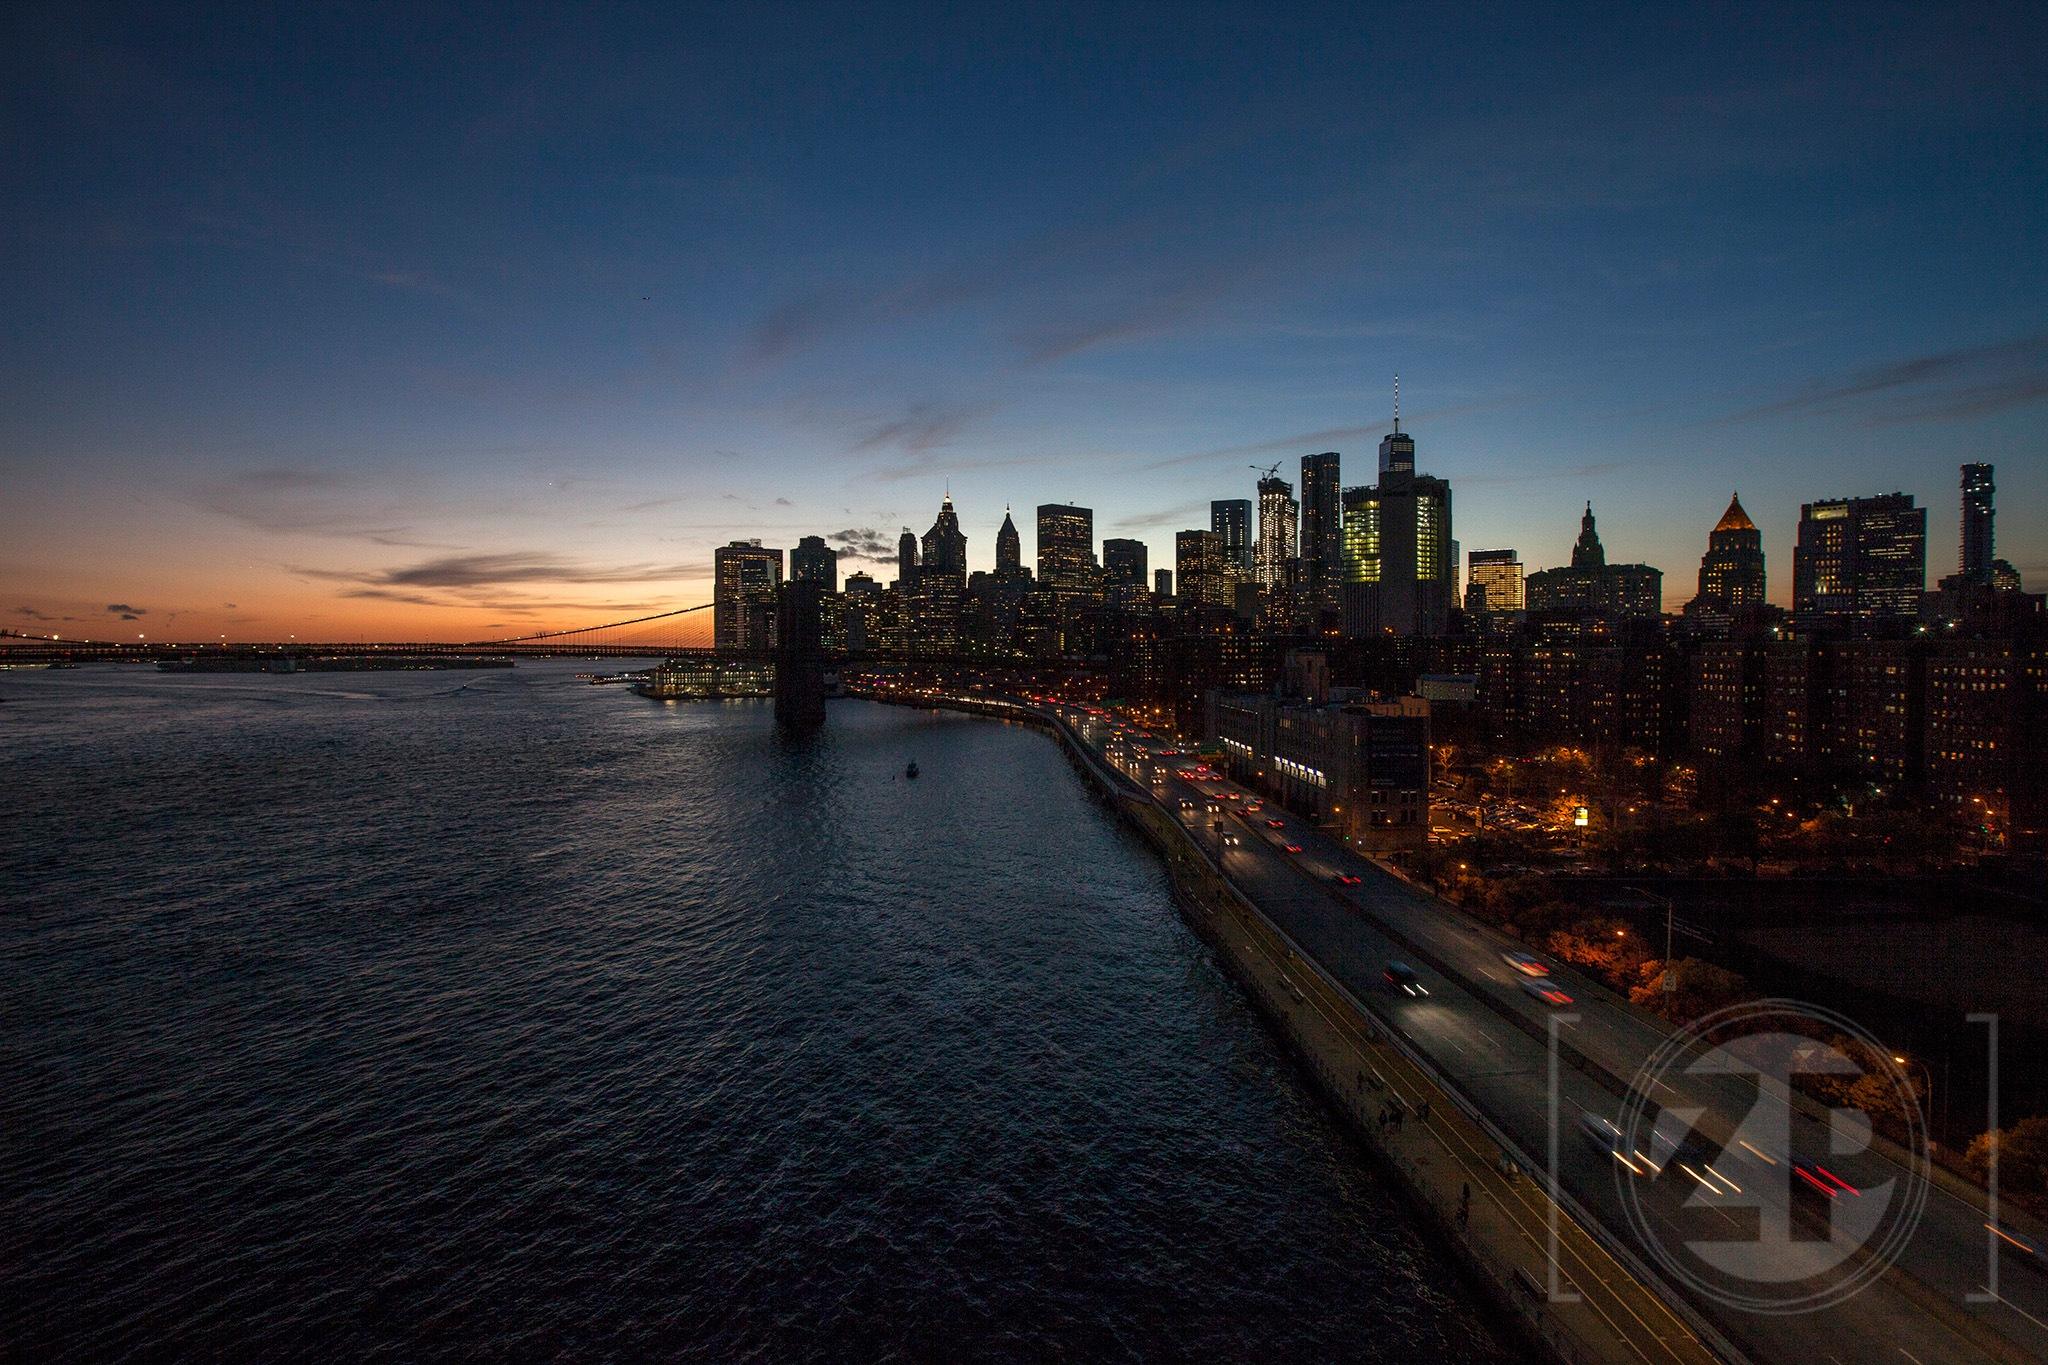 New York by Patrick van Gemert